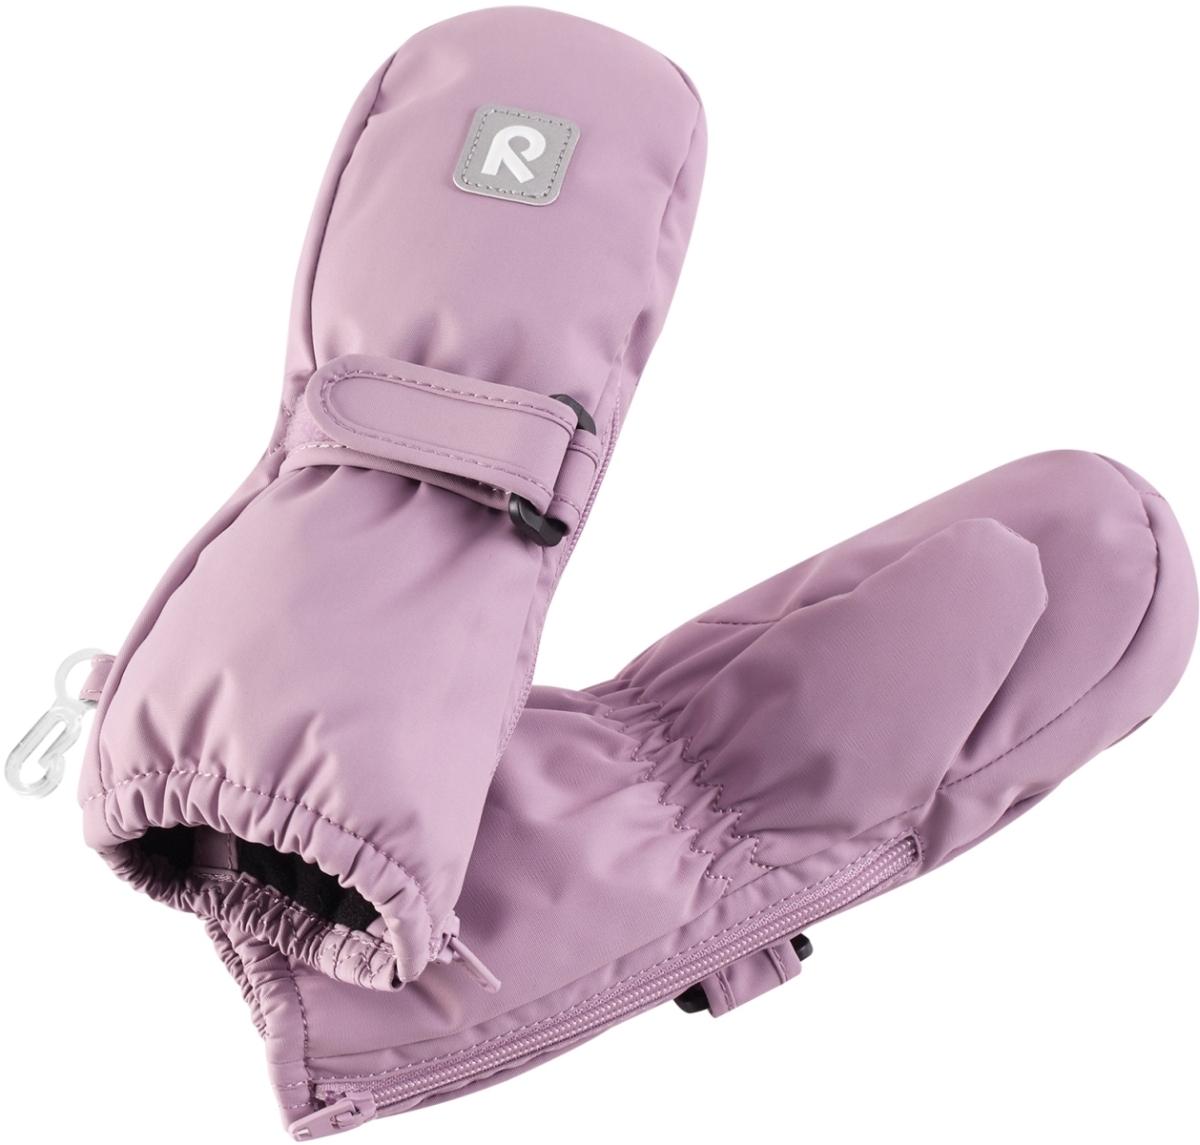 b2da12ea87b Dětské palčáky Reima Tassu - heather pink - Skibi Kids